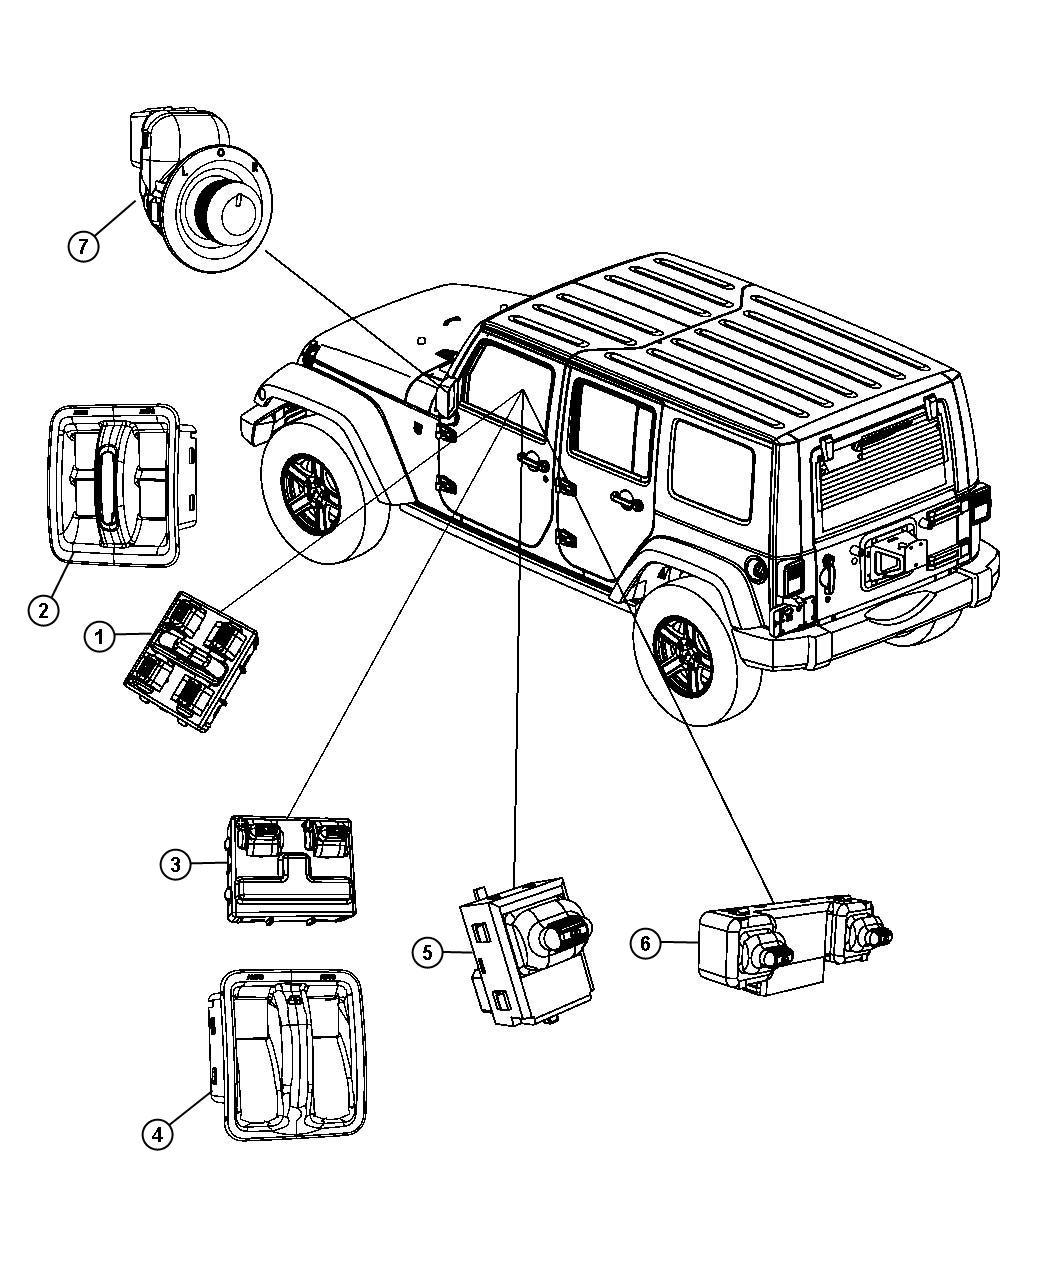 3 Gang 3 Way Switch Wiring Diagram